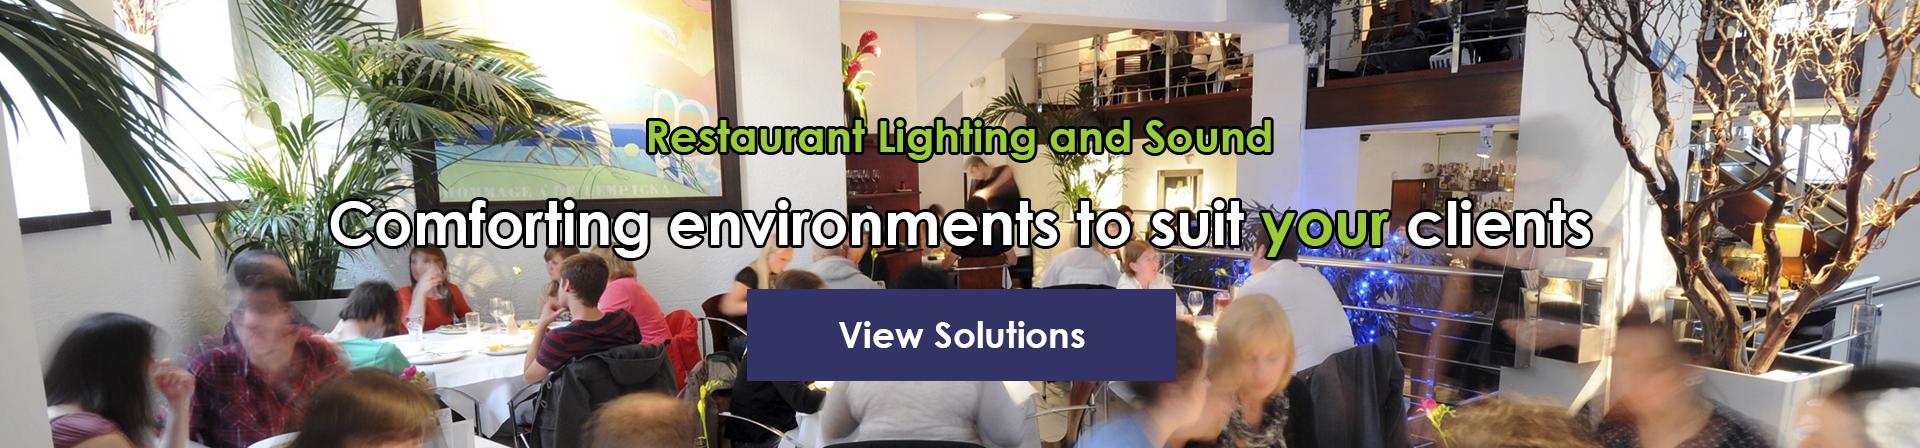 Restaurant Sound and Lighting